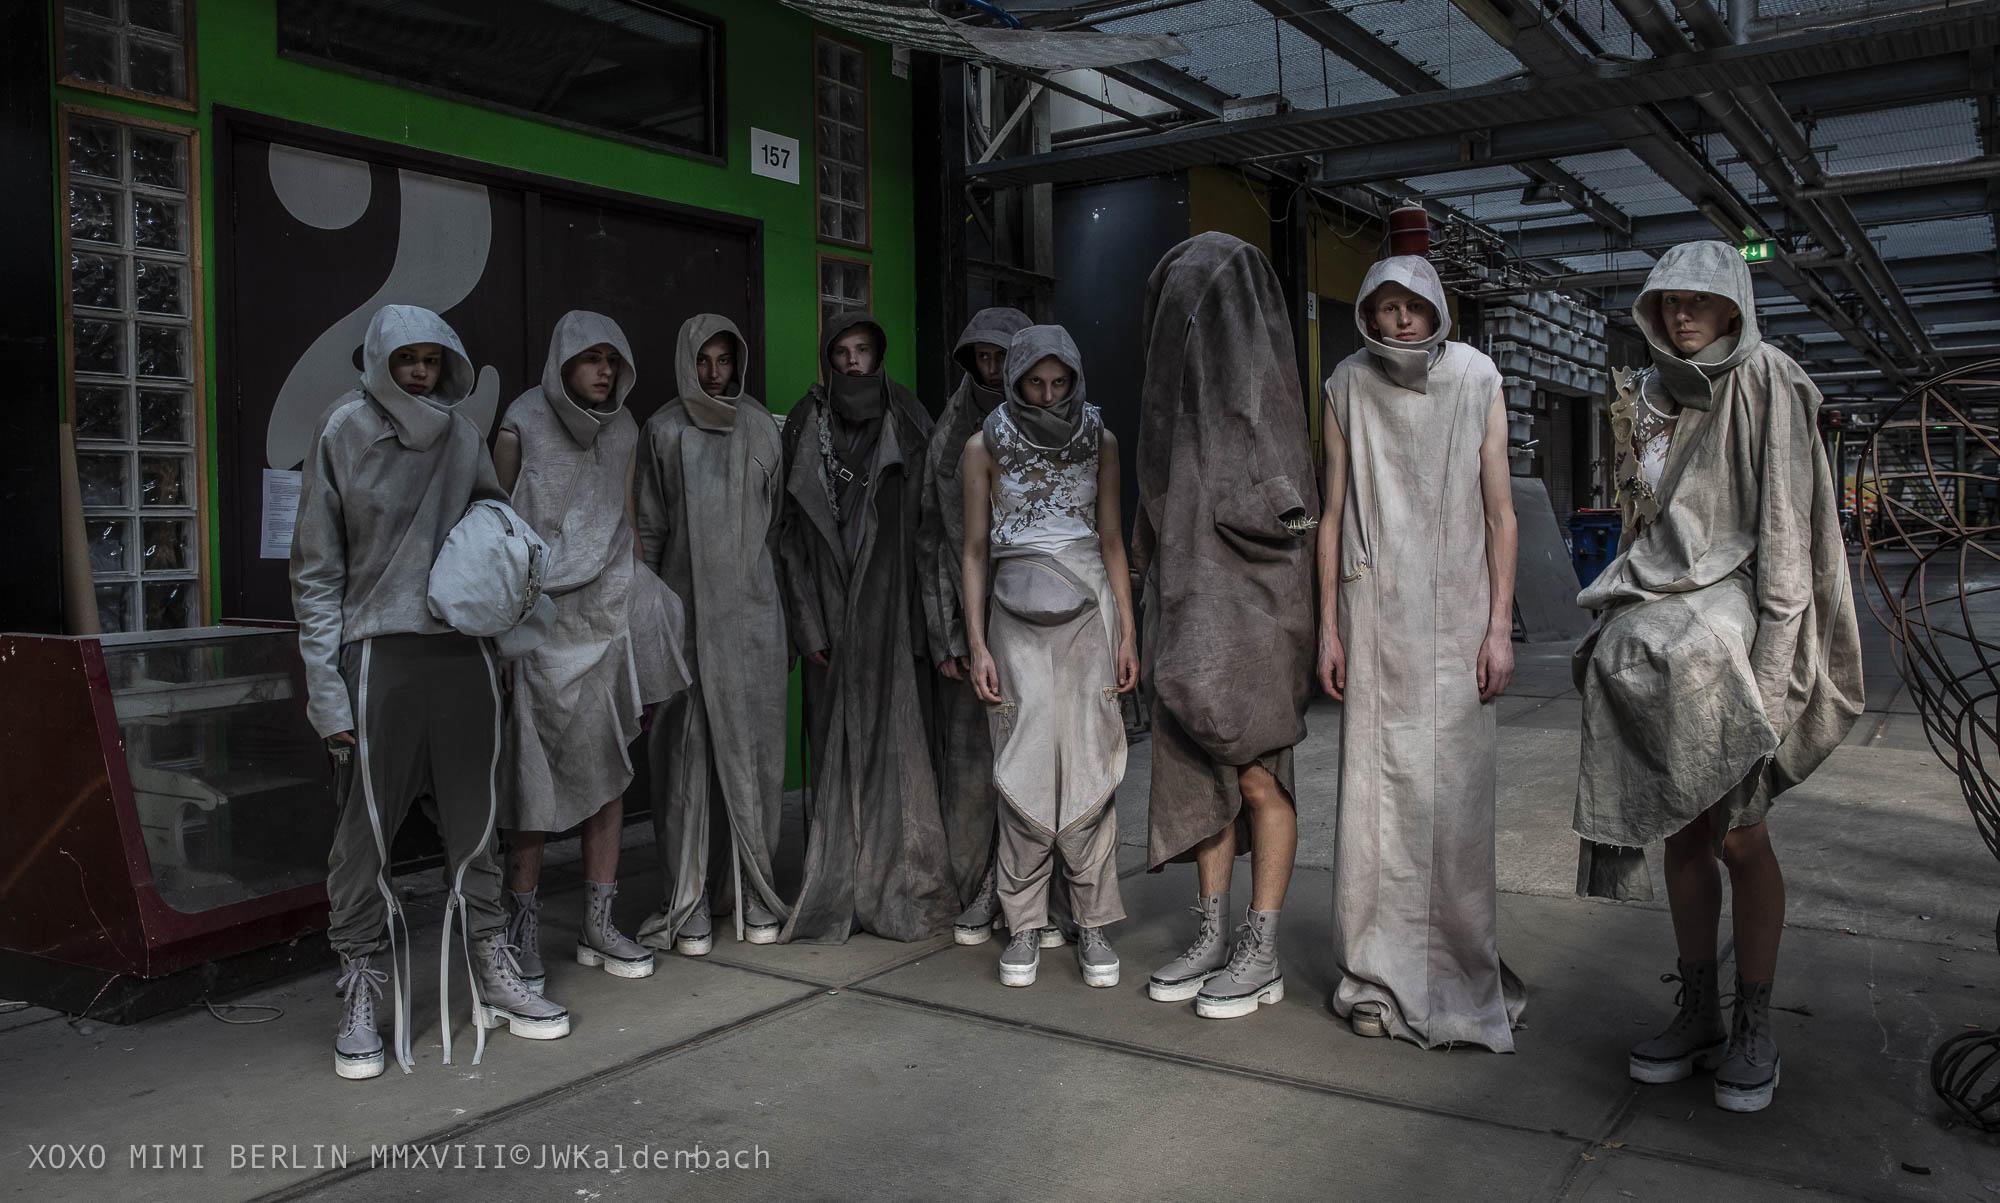 rietveld_fashionshow_2018_kaldenbach_berlin-0356